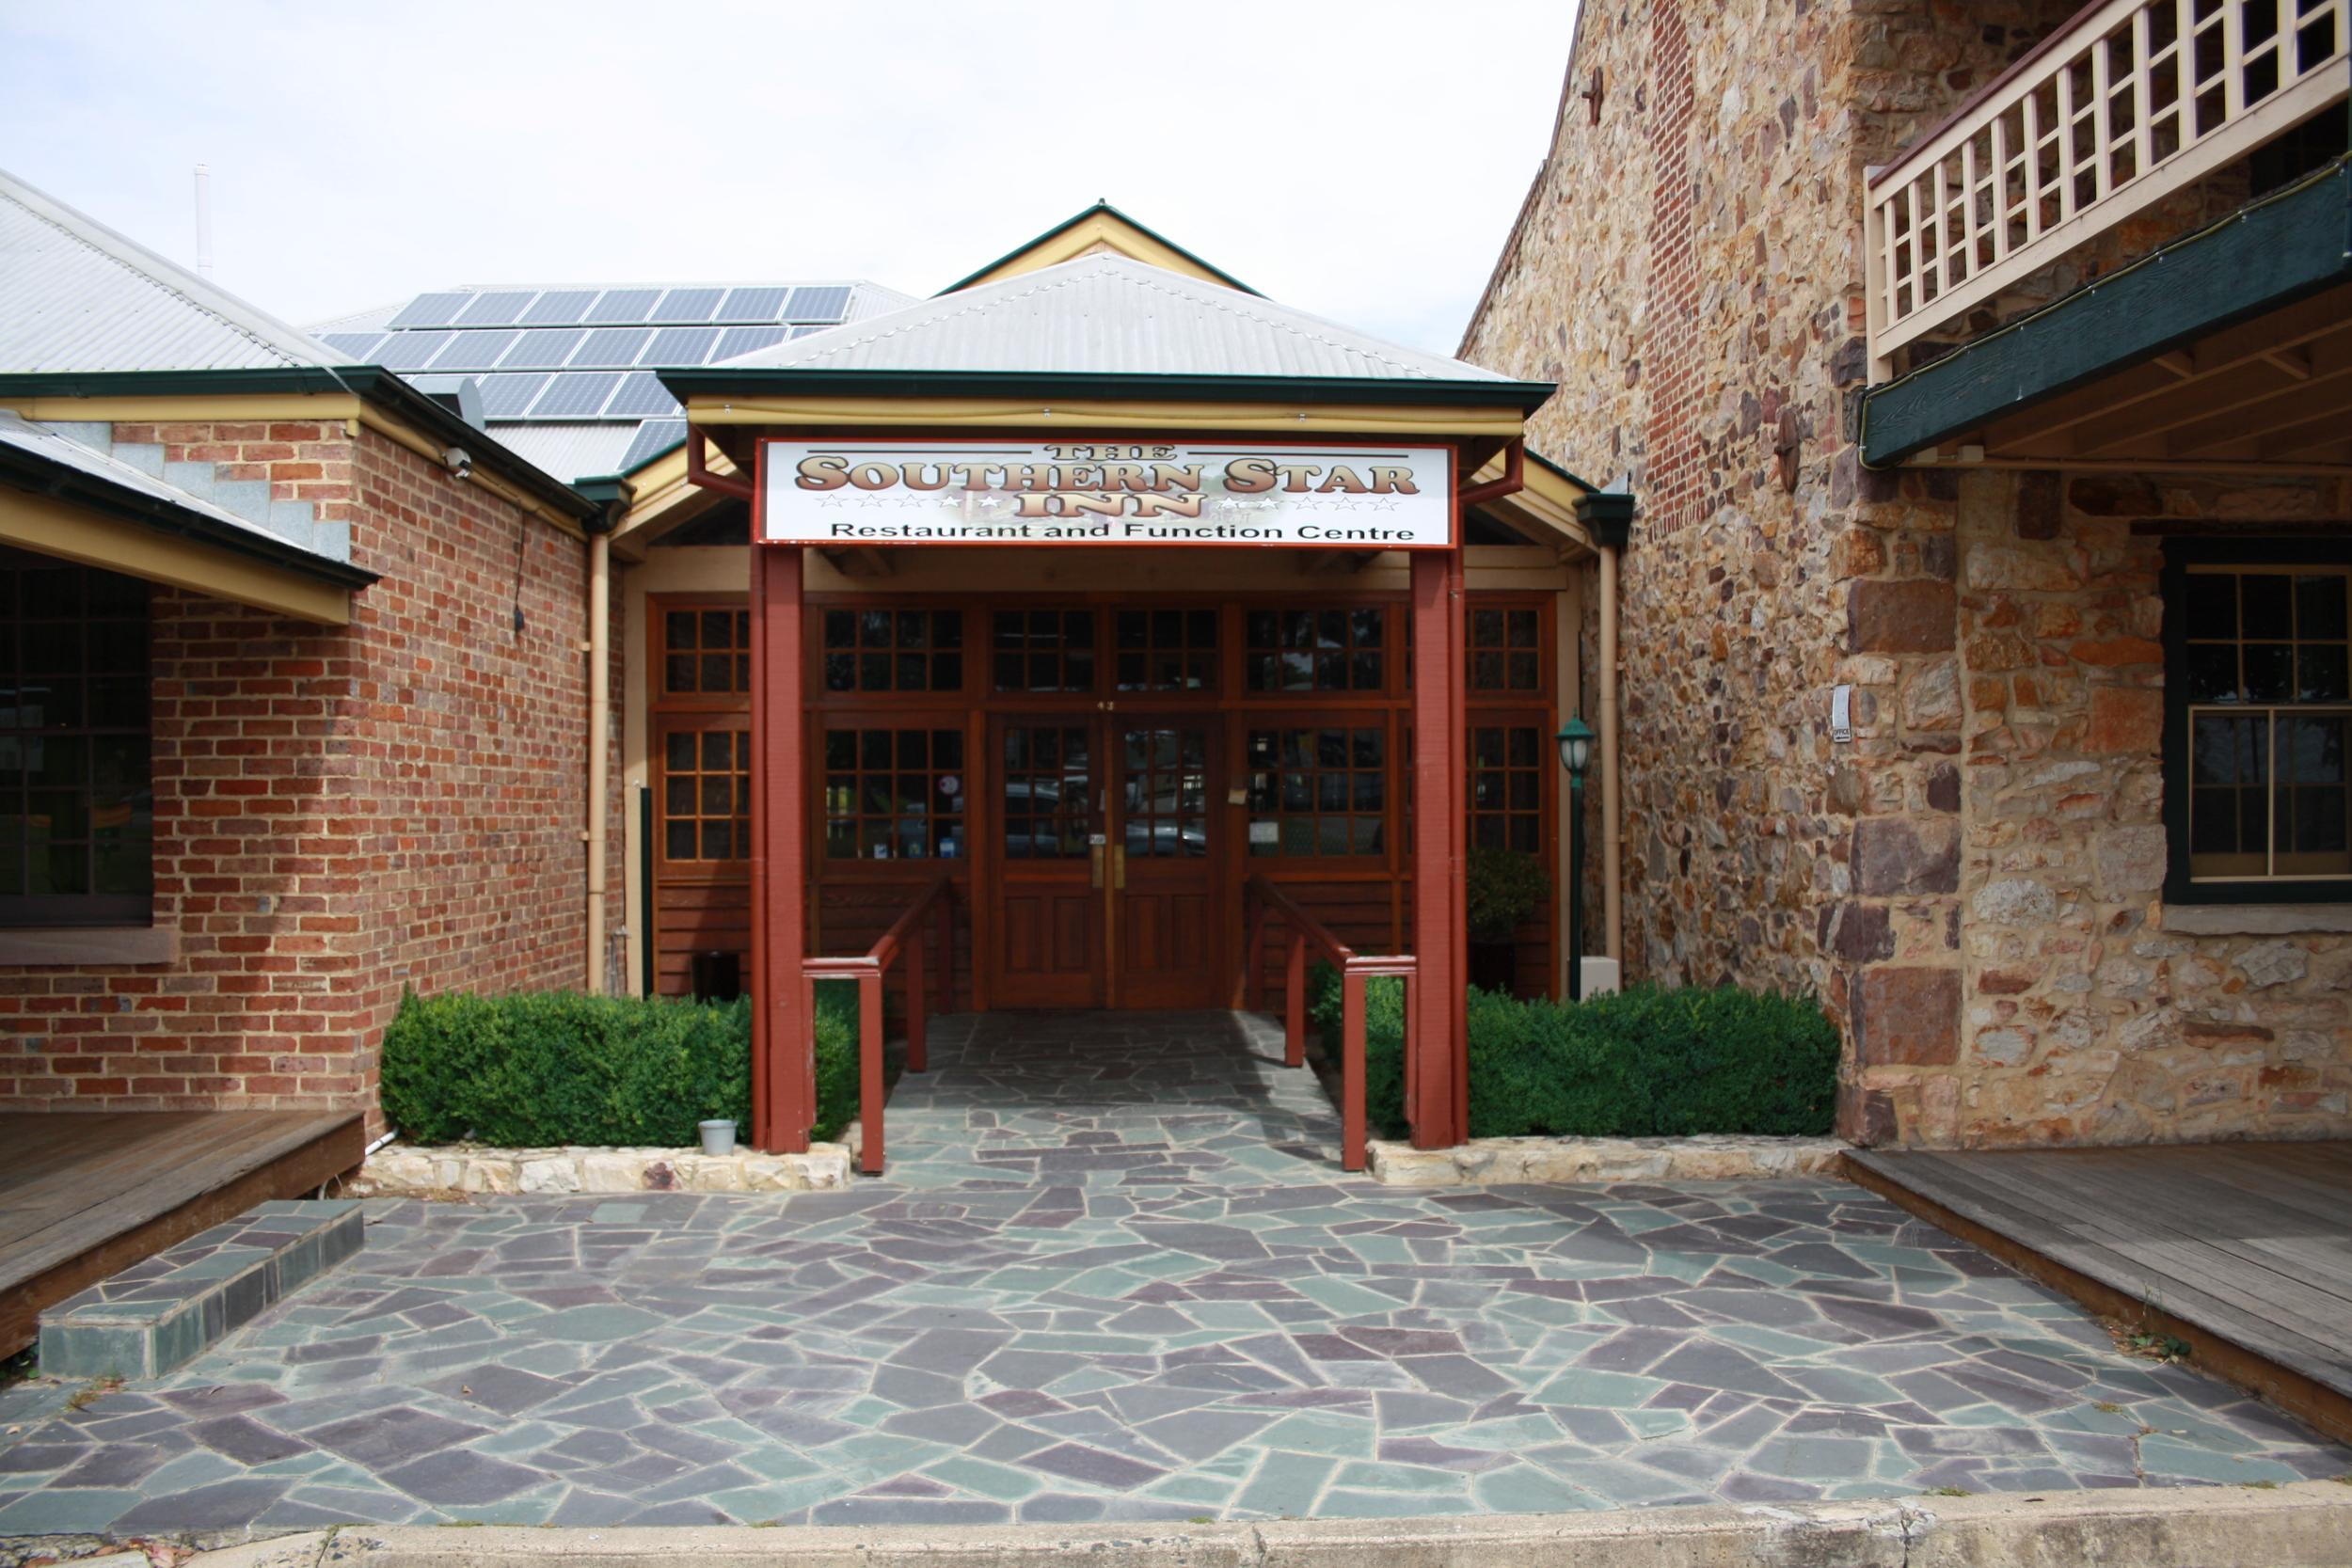 Andrew_Economos_Custom_Builder_Bowral_NSW_Australia_Commercial_5.JPG